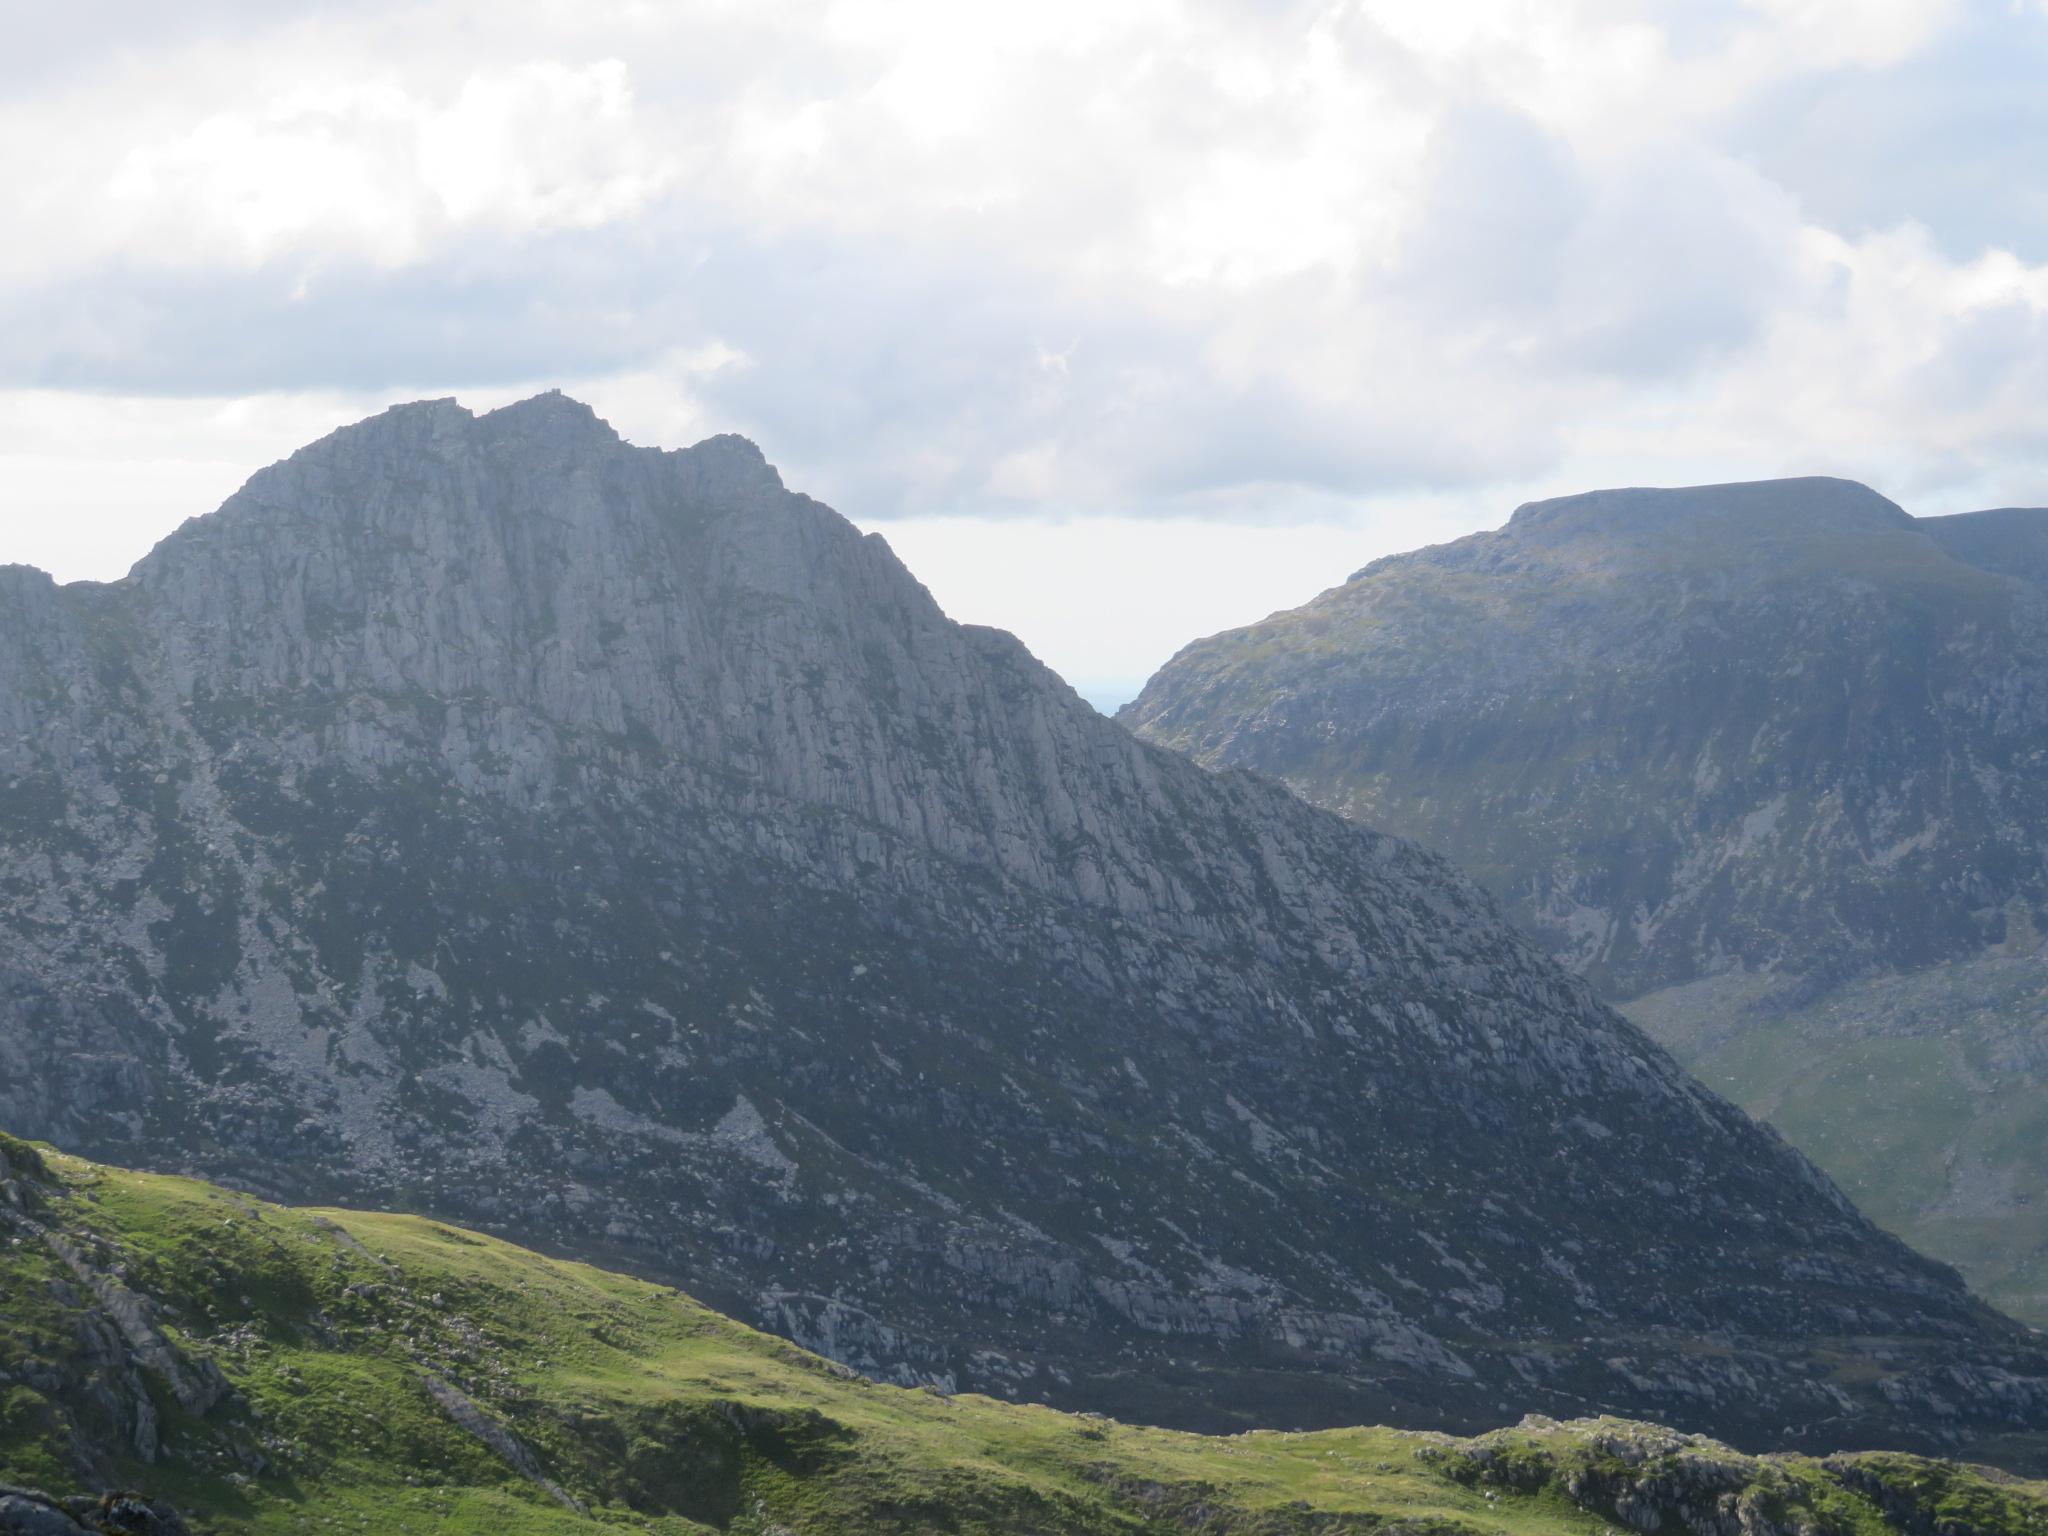 United Kingdom Wales Snowdonia, Glyderau from Pen-y-Pass, Tryfan from ... near Glyder Fach, Walkopedia